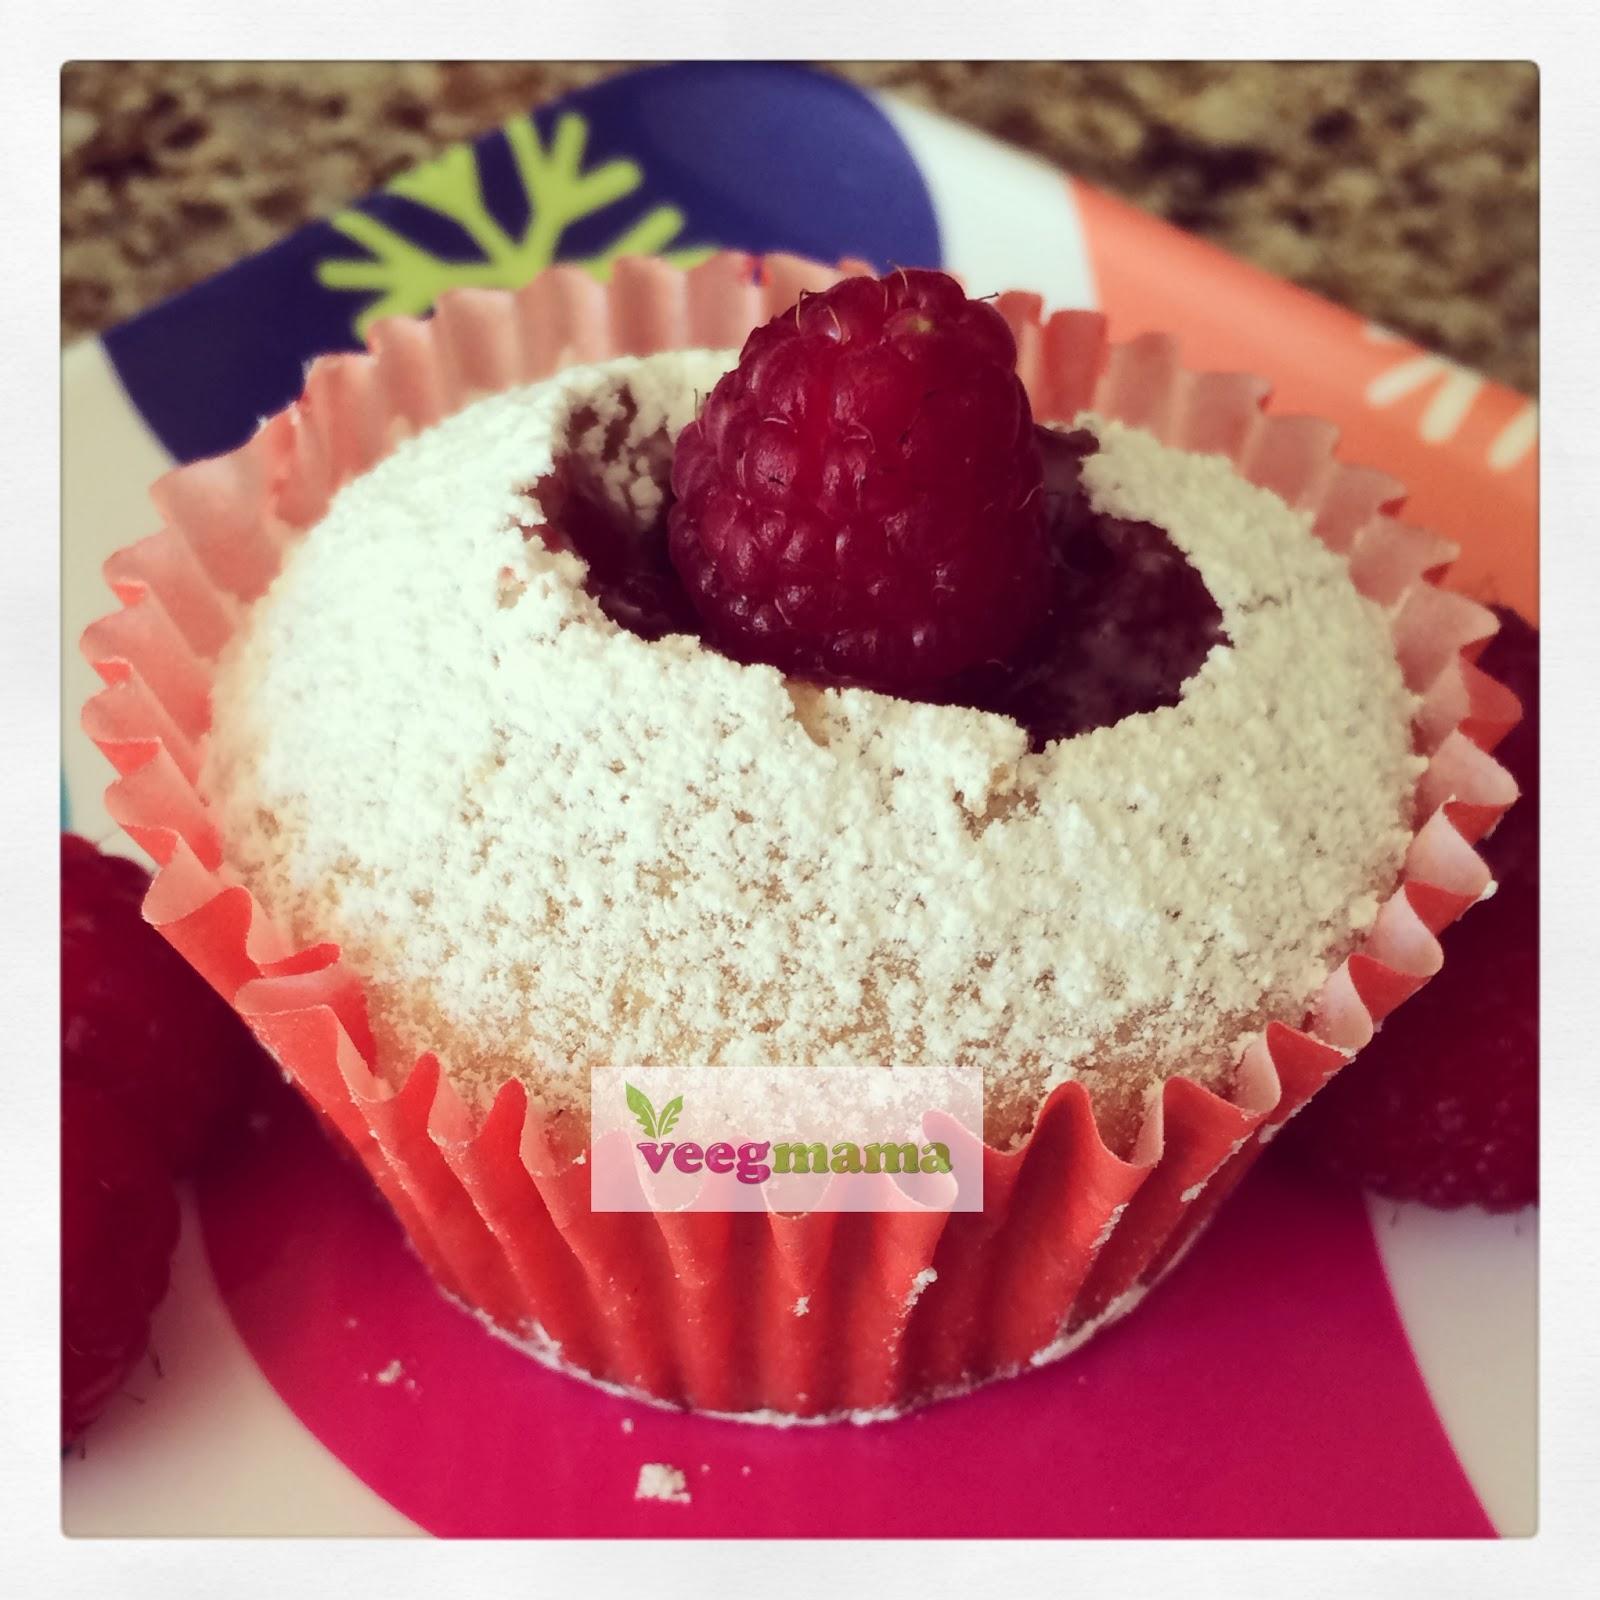 Vegan and Gluten-Free Vanilla Raspberry Cupcakes